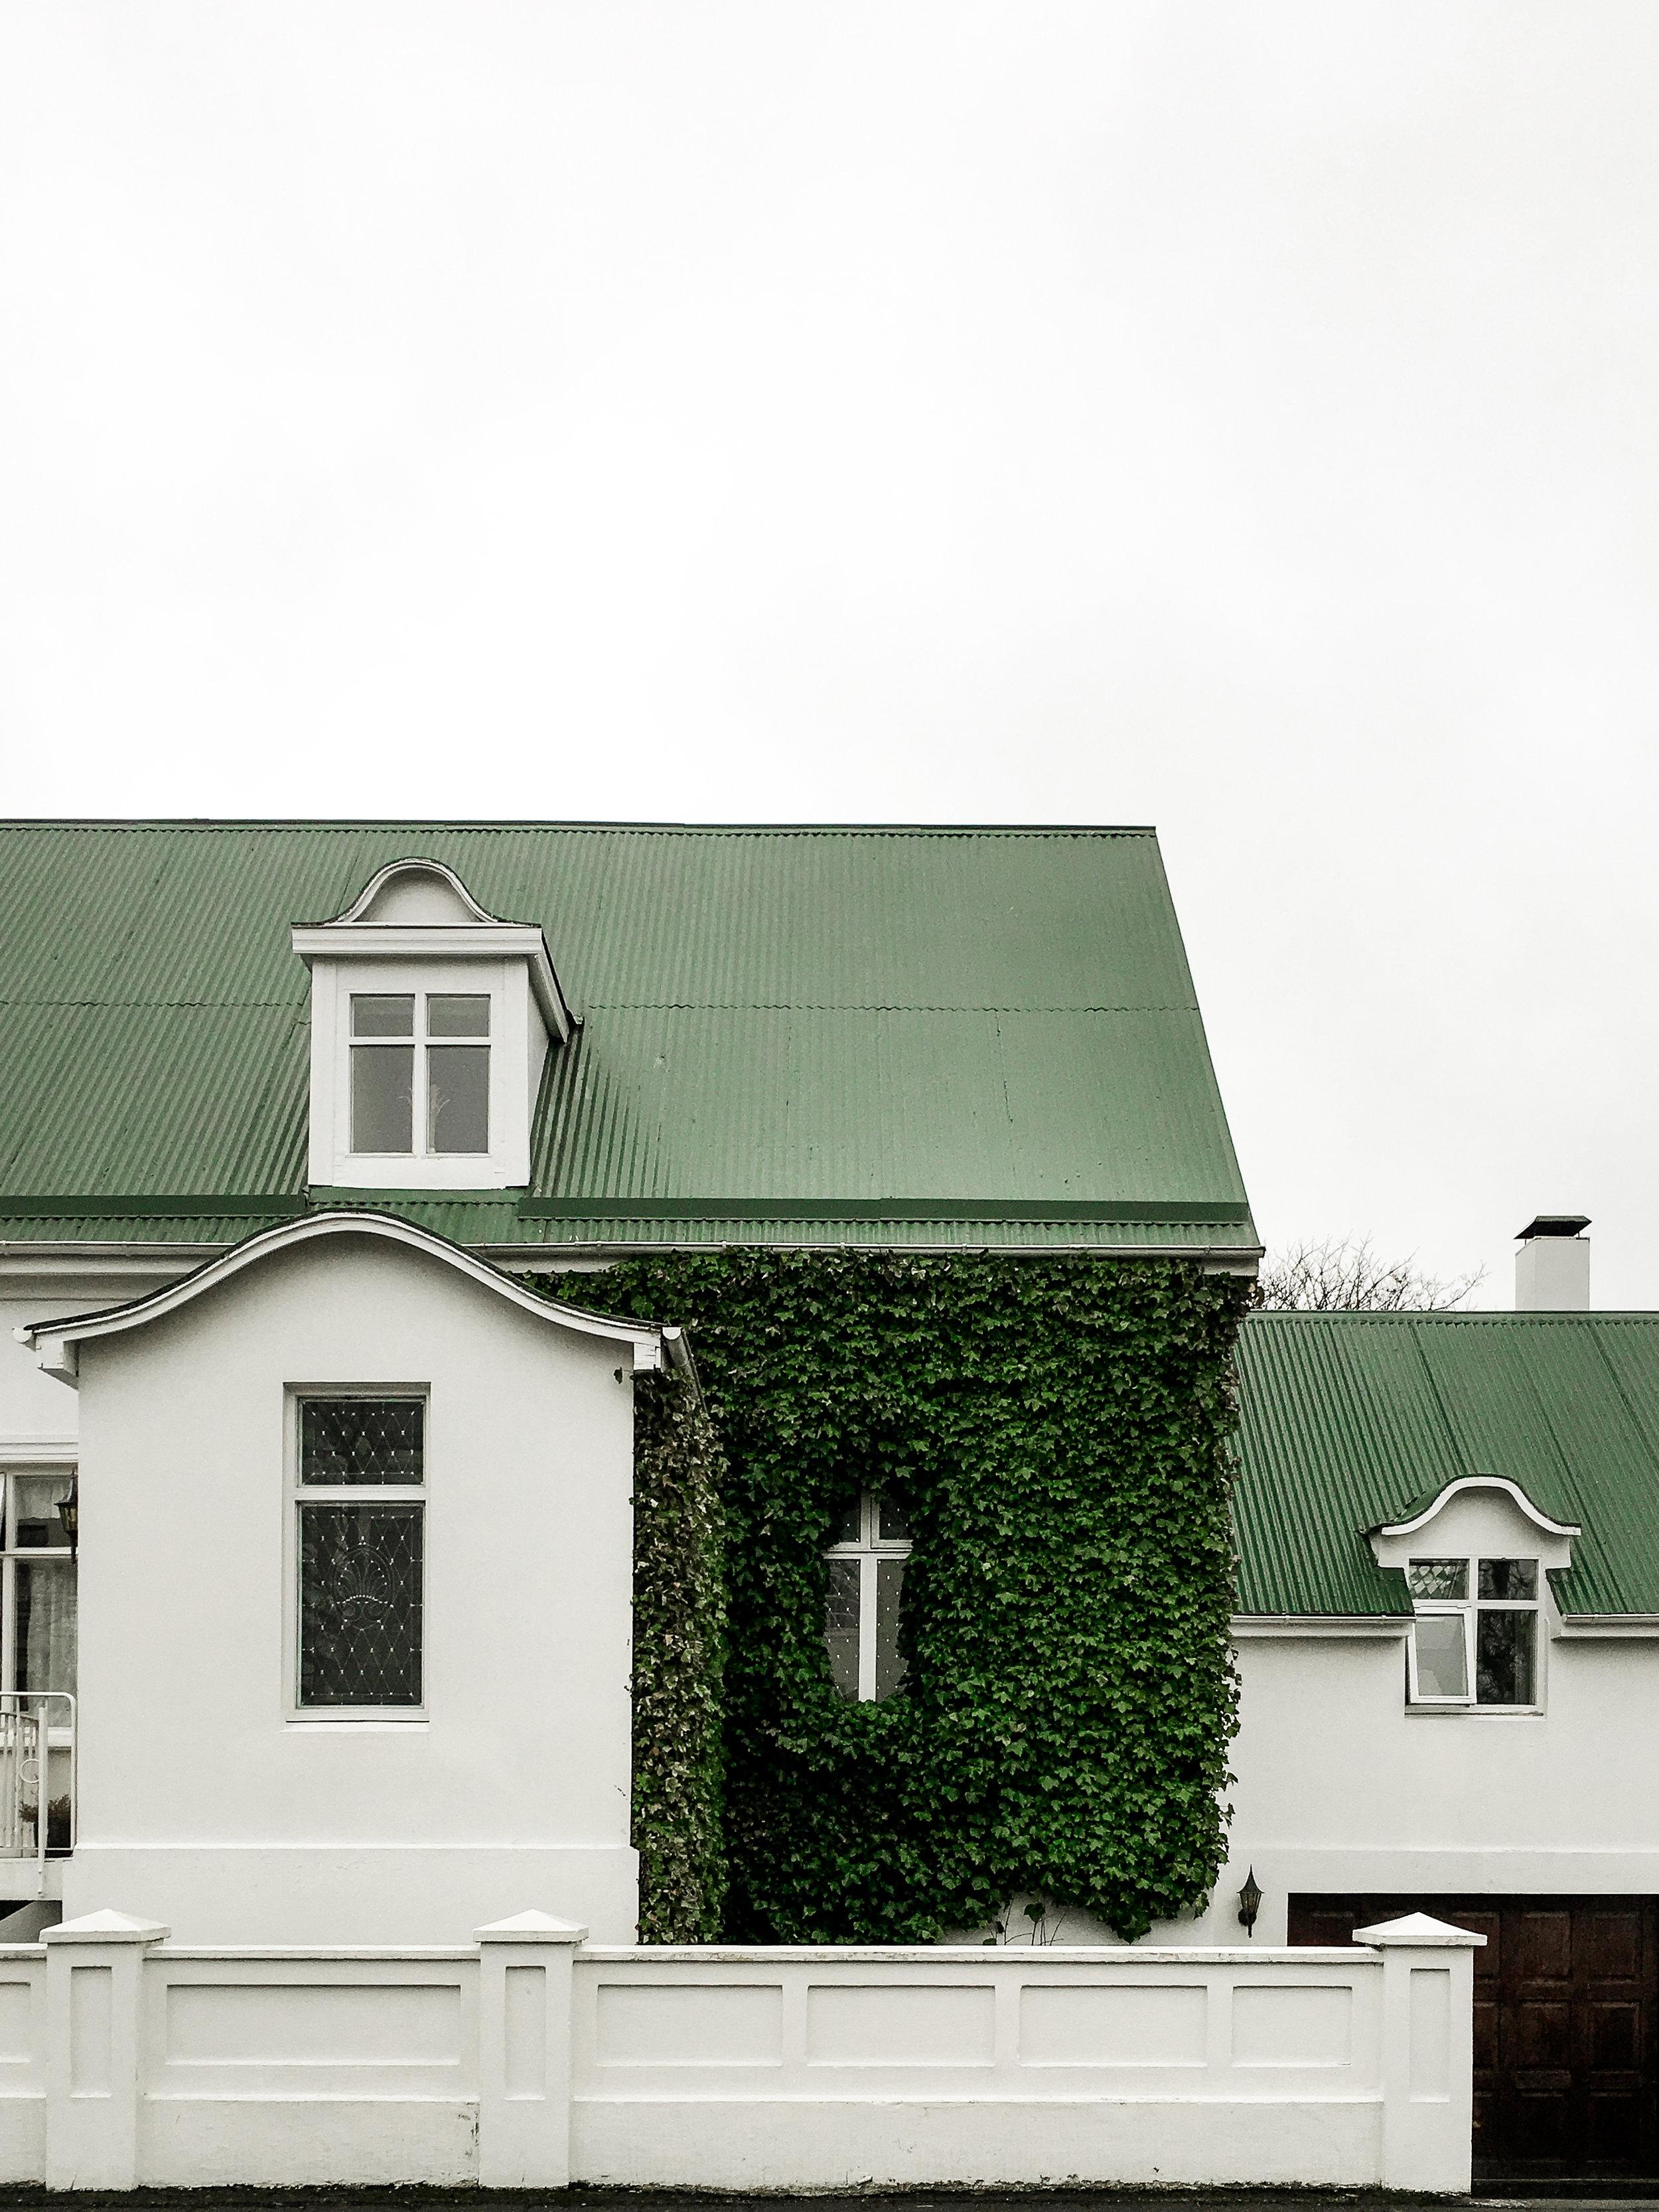 Iceland-4875.jpg